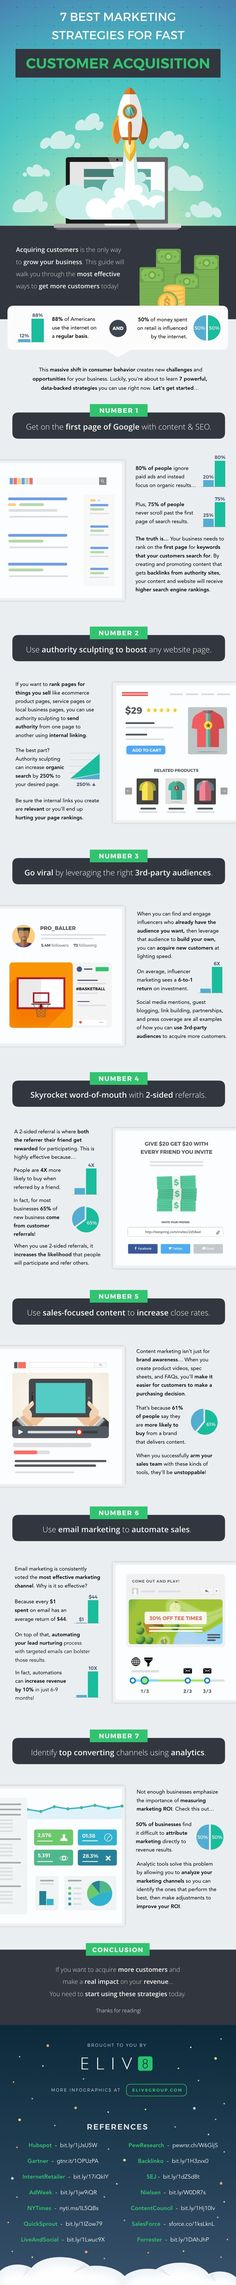 SEO, Social Media, Email, Influencer Marketing: 7 Ways To Dramatically Improve Your Customer Acquisition - #infographic - http://www.popularaz.com/seo-social-media-email-influencer-marketing-7-ways-to-dramatically-improve-your-customer-acquisition-infographic/